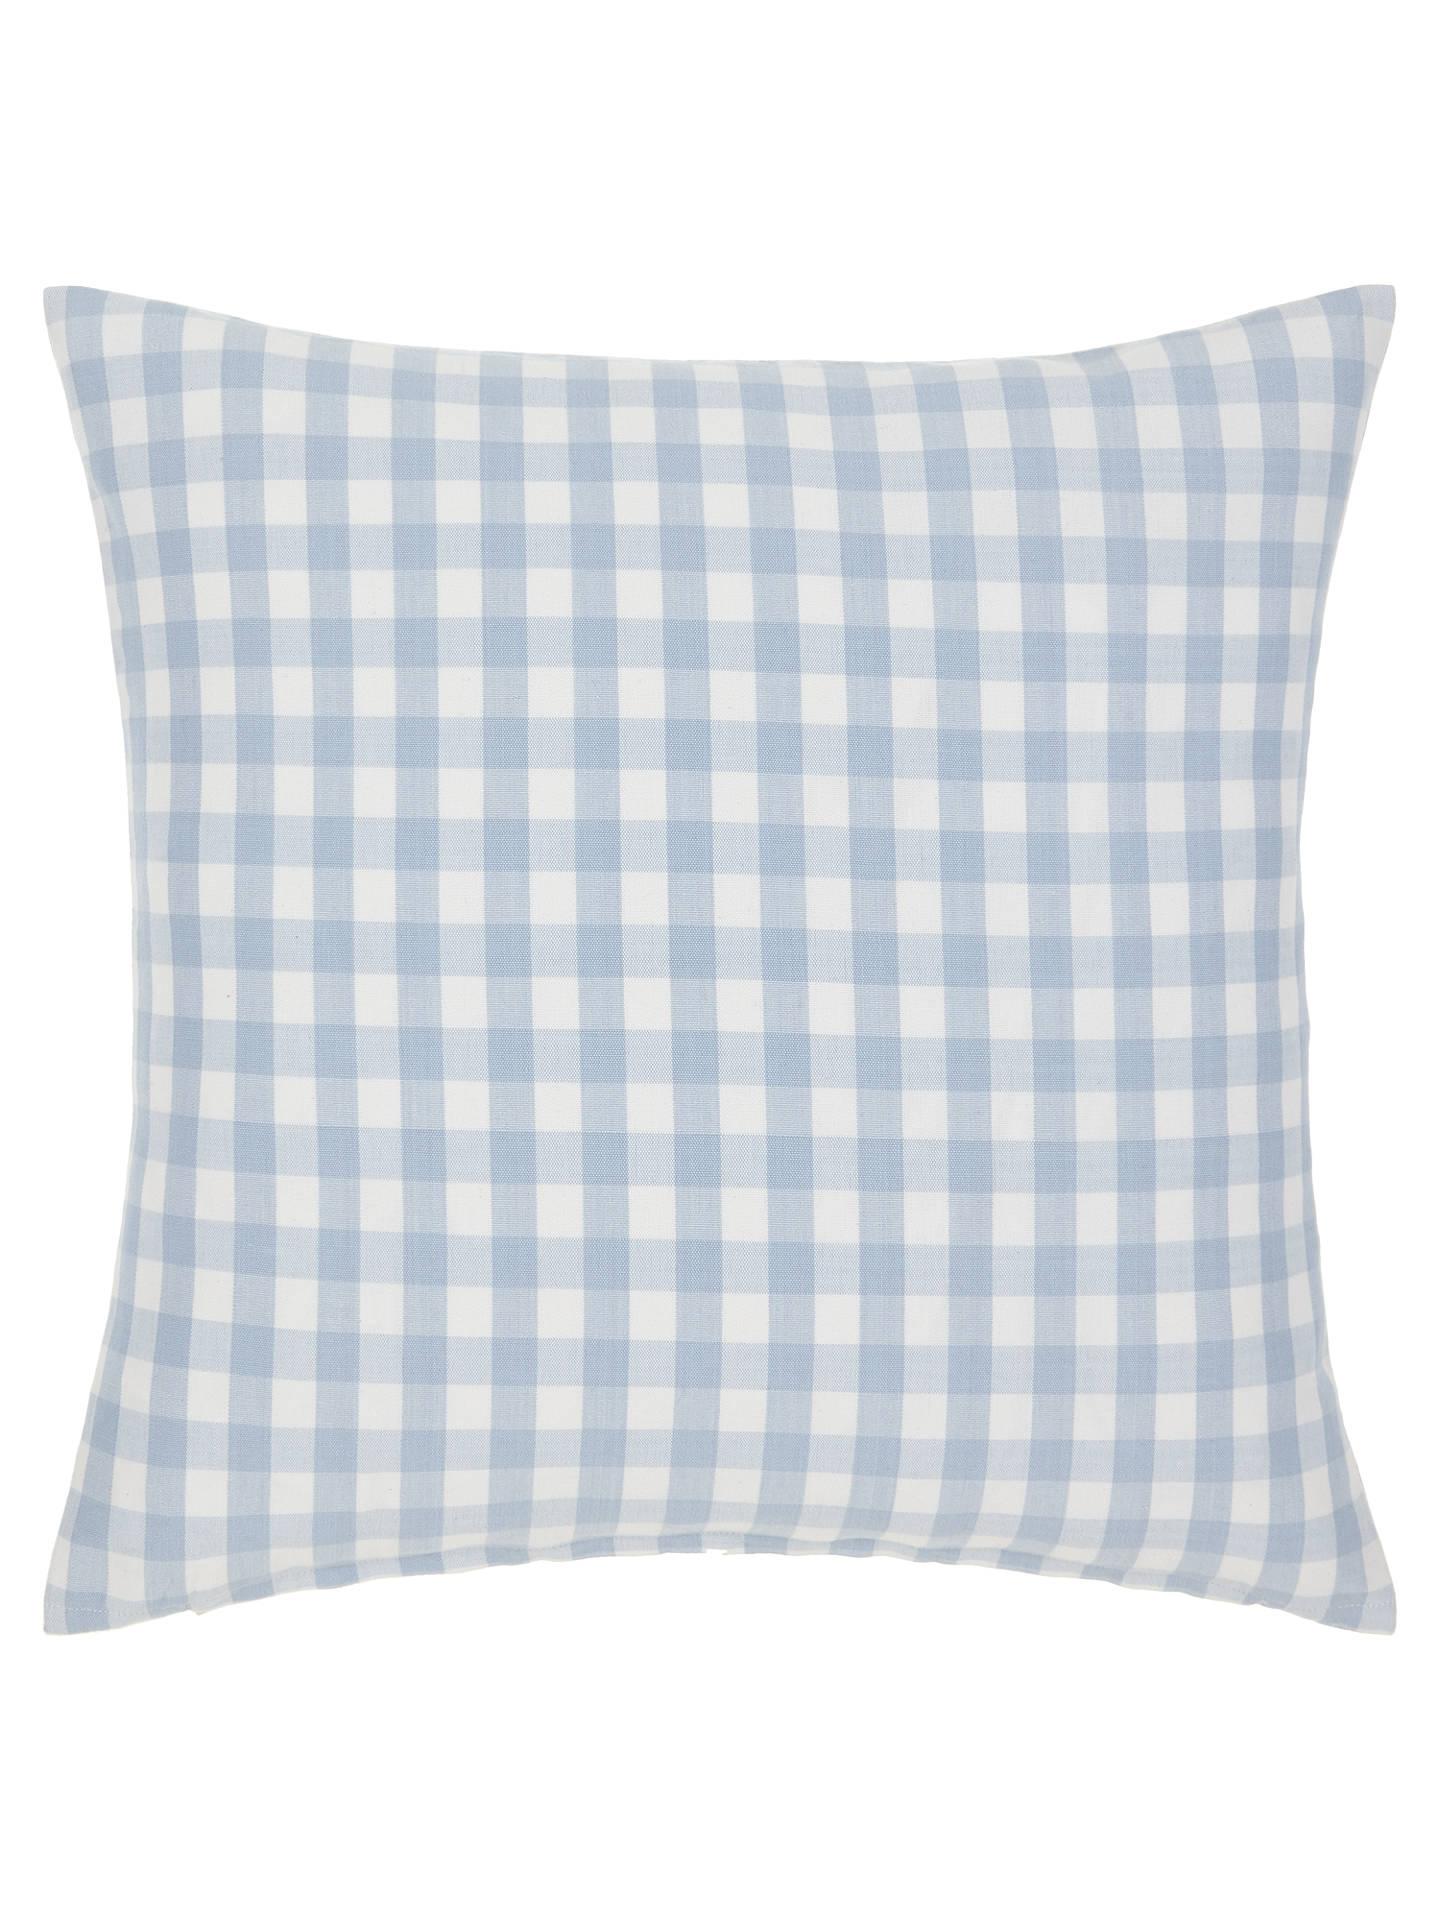 8ca0fdd0a24 Buy John Lewis Gingham Check Cushion, Blue Online at johnlewis.com ...